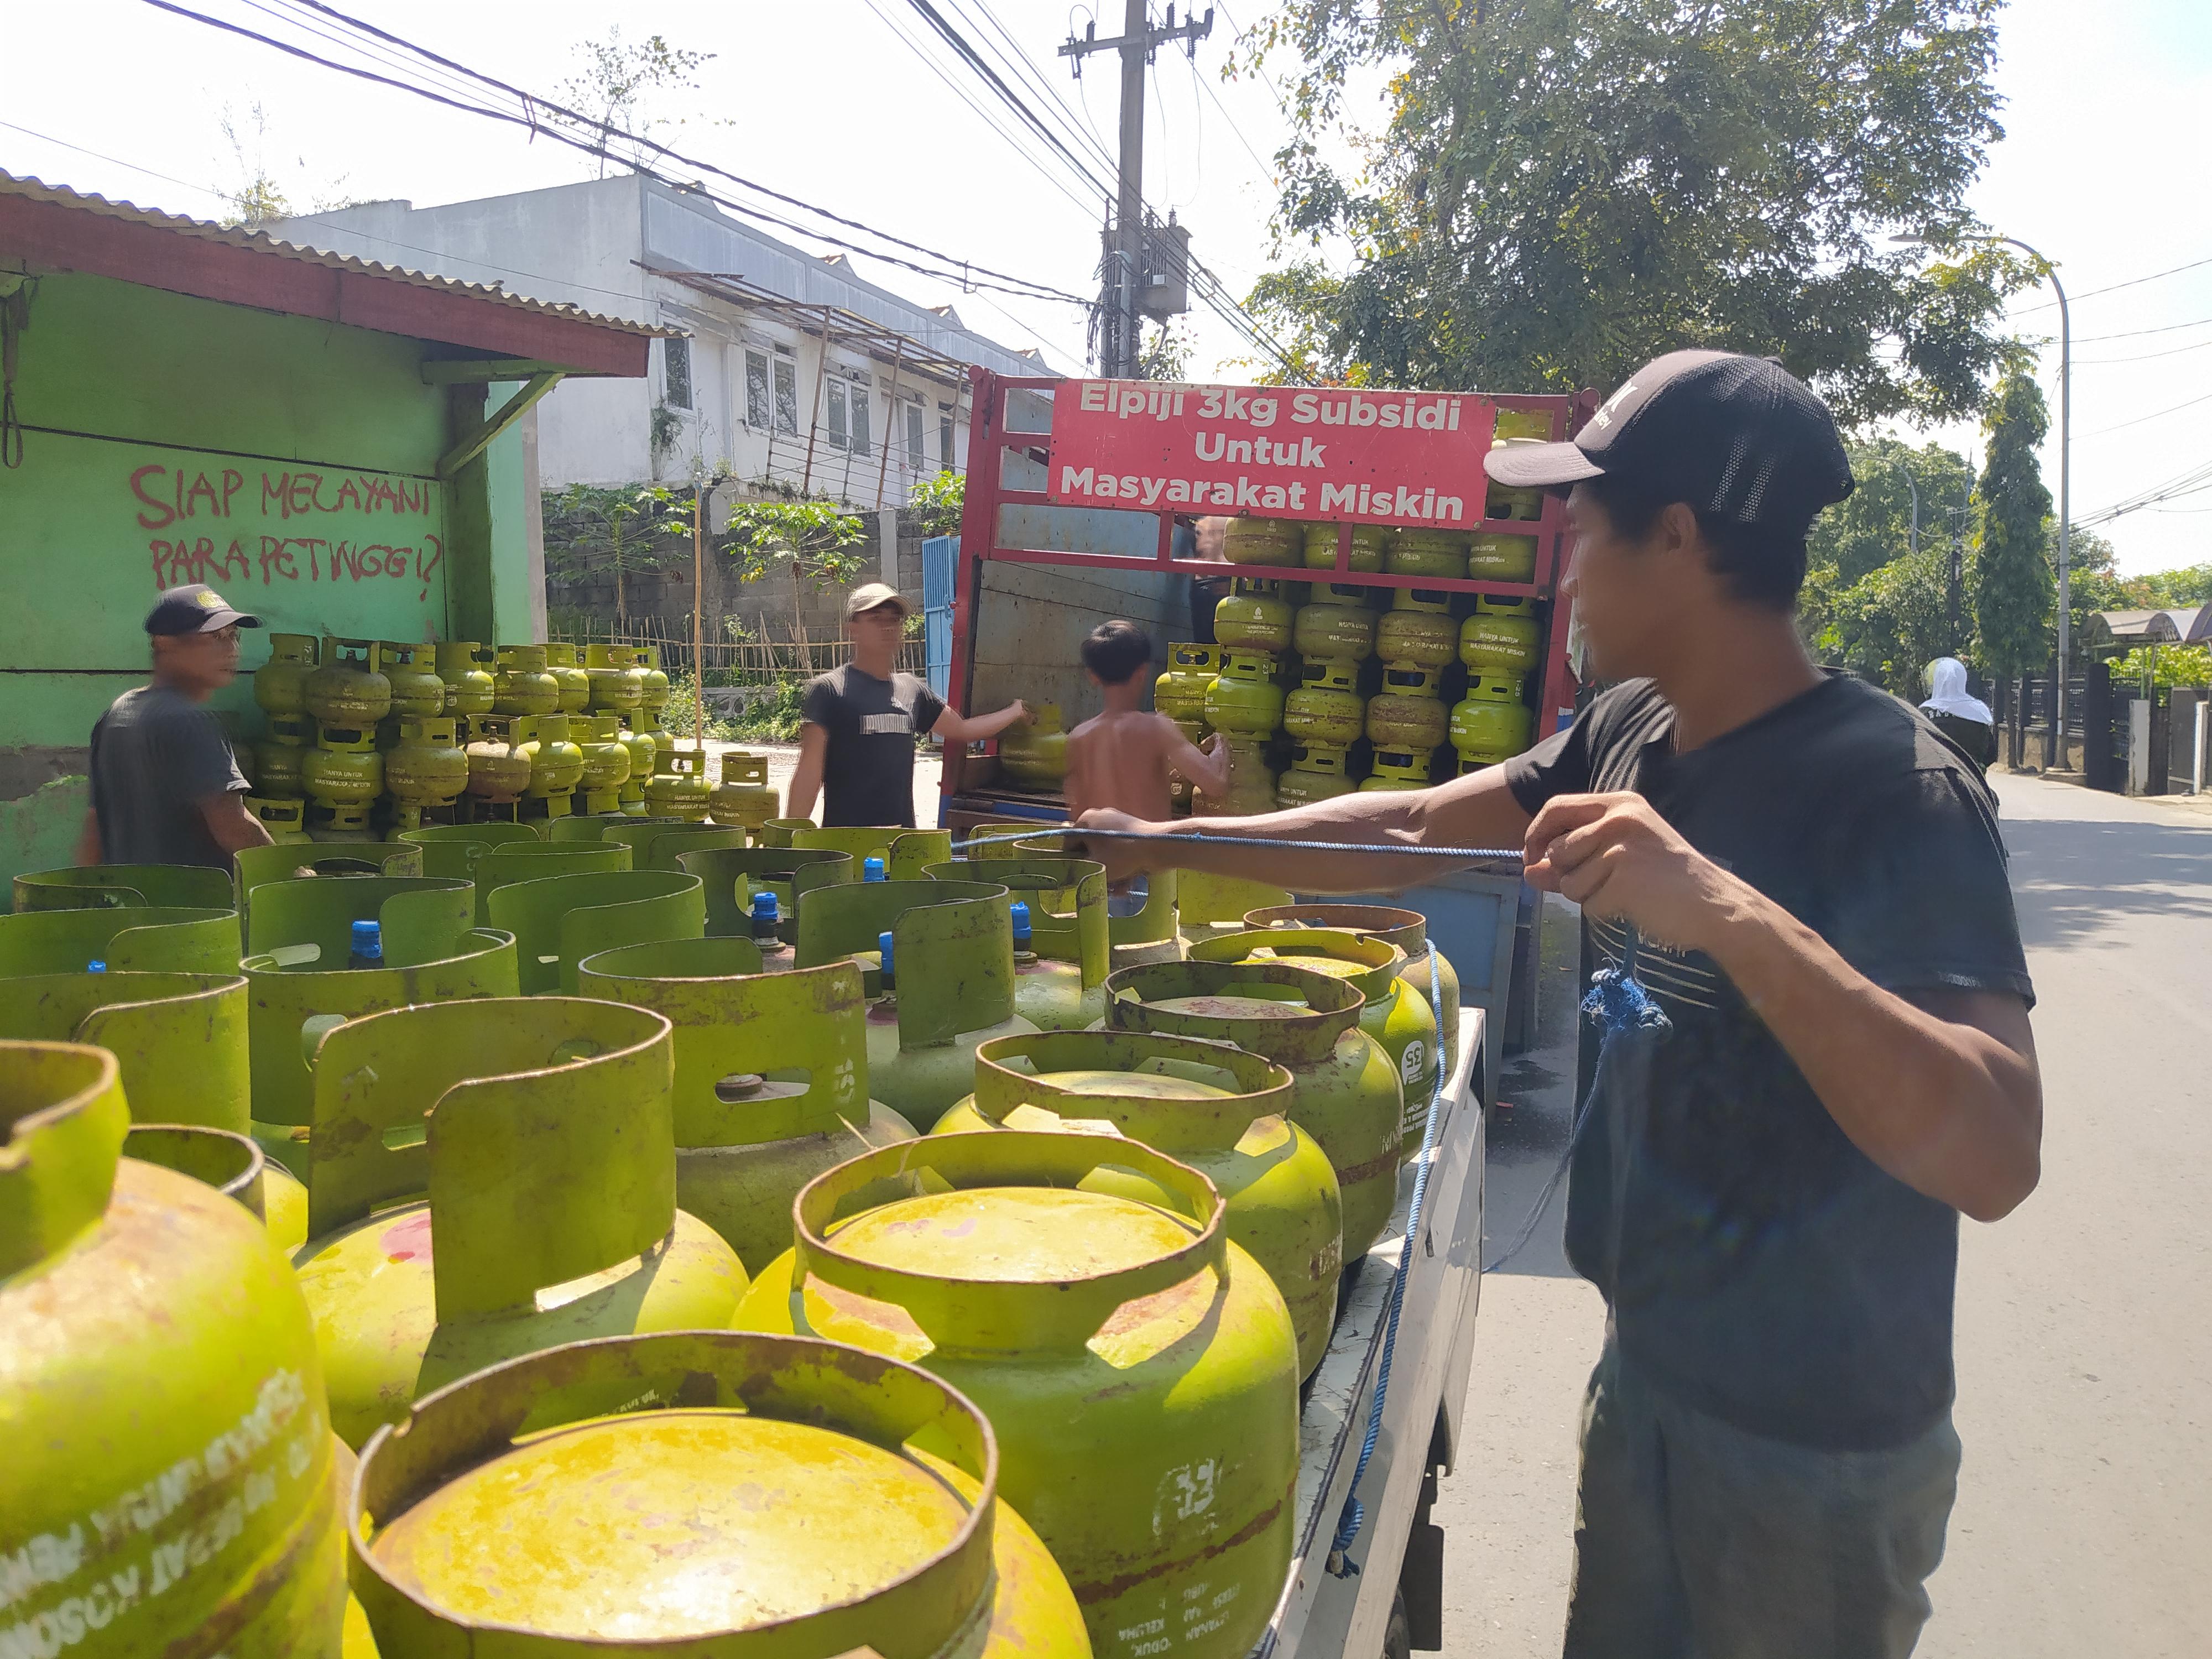 Pasokan  Gas 3 Kg di Cimahi Ditambah Selama Ramadan 2021